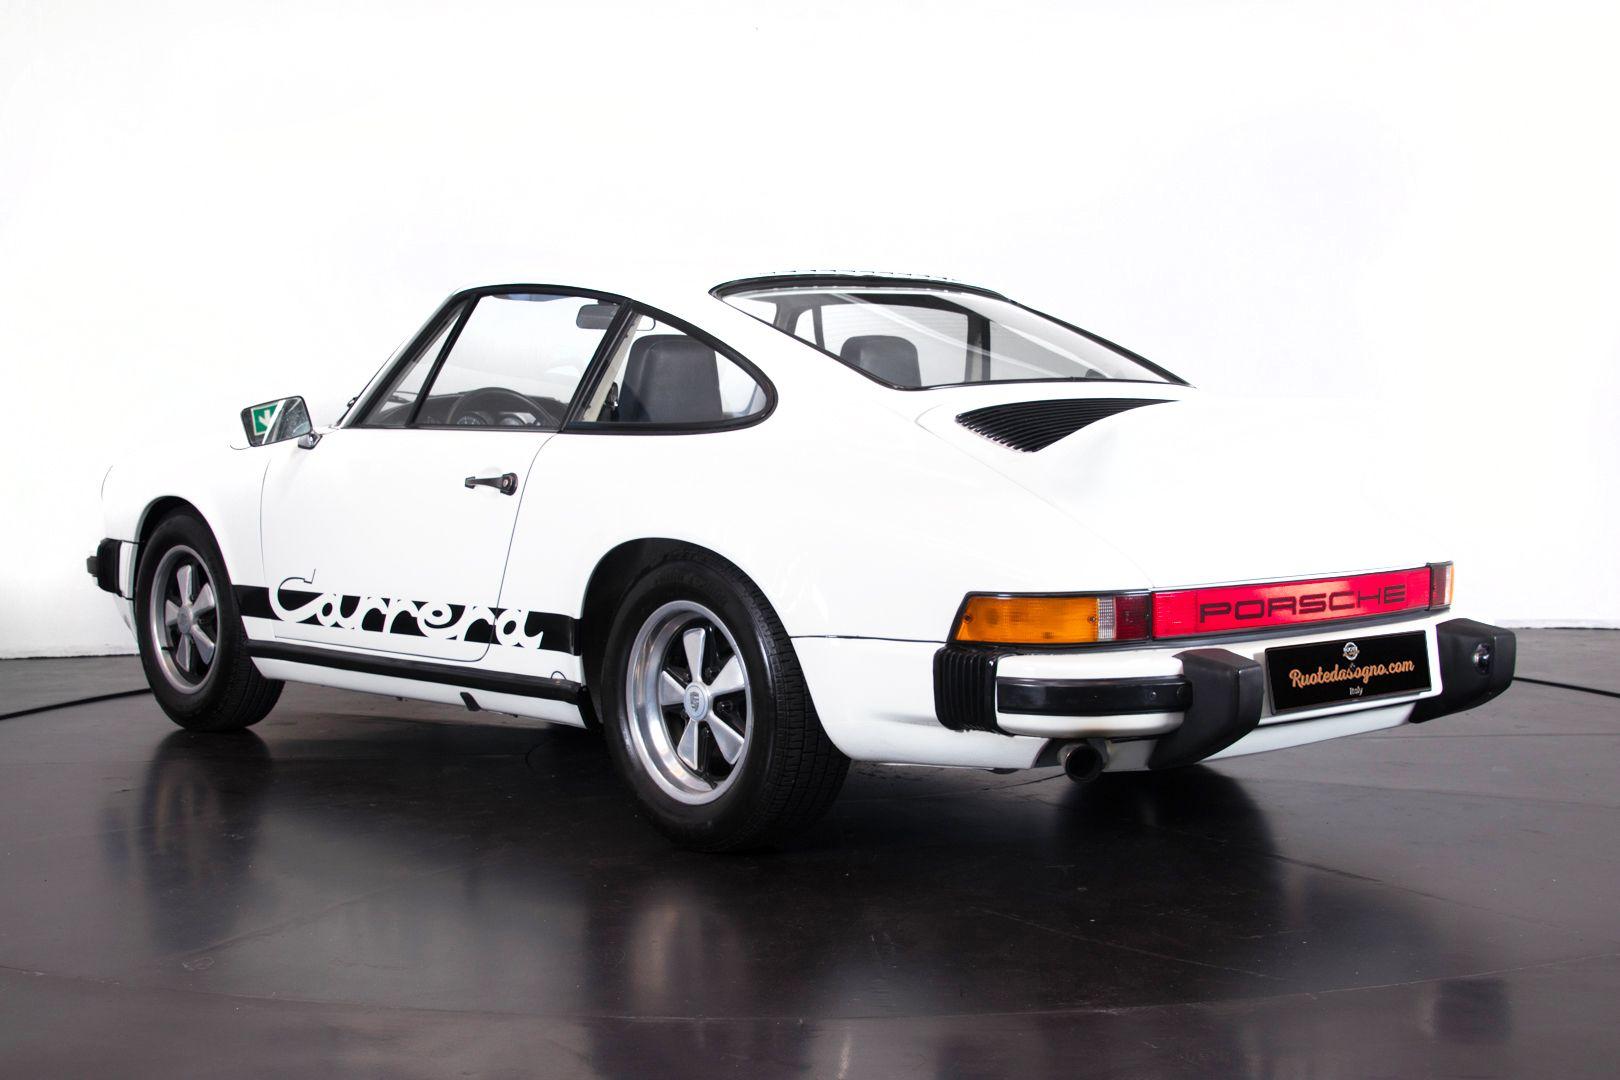 1973 Porsche 911 Carrera 2.7 26472